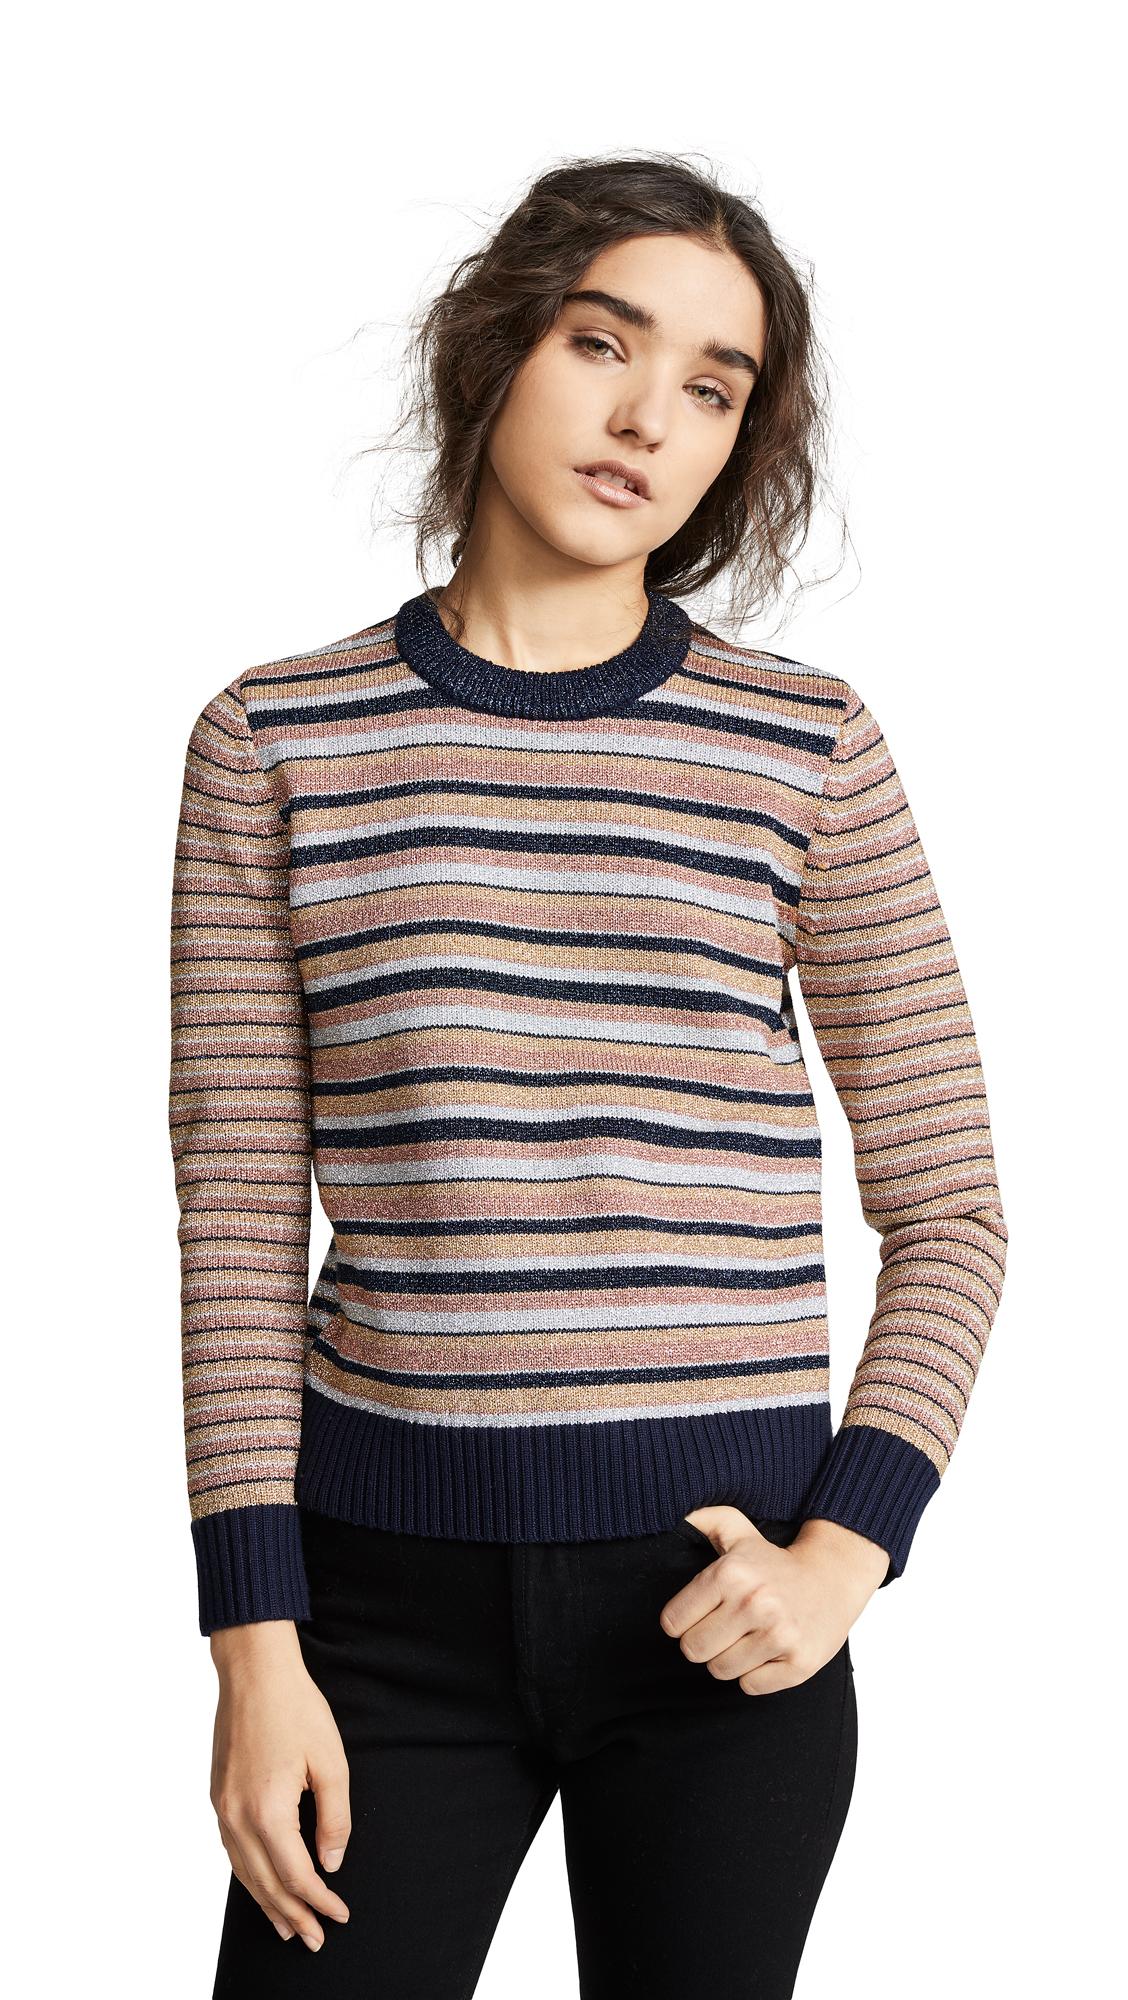 Tory Burch Metallic Stripe Sweater - Lurex Stripe